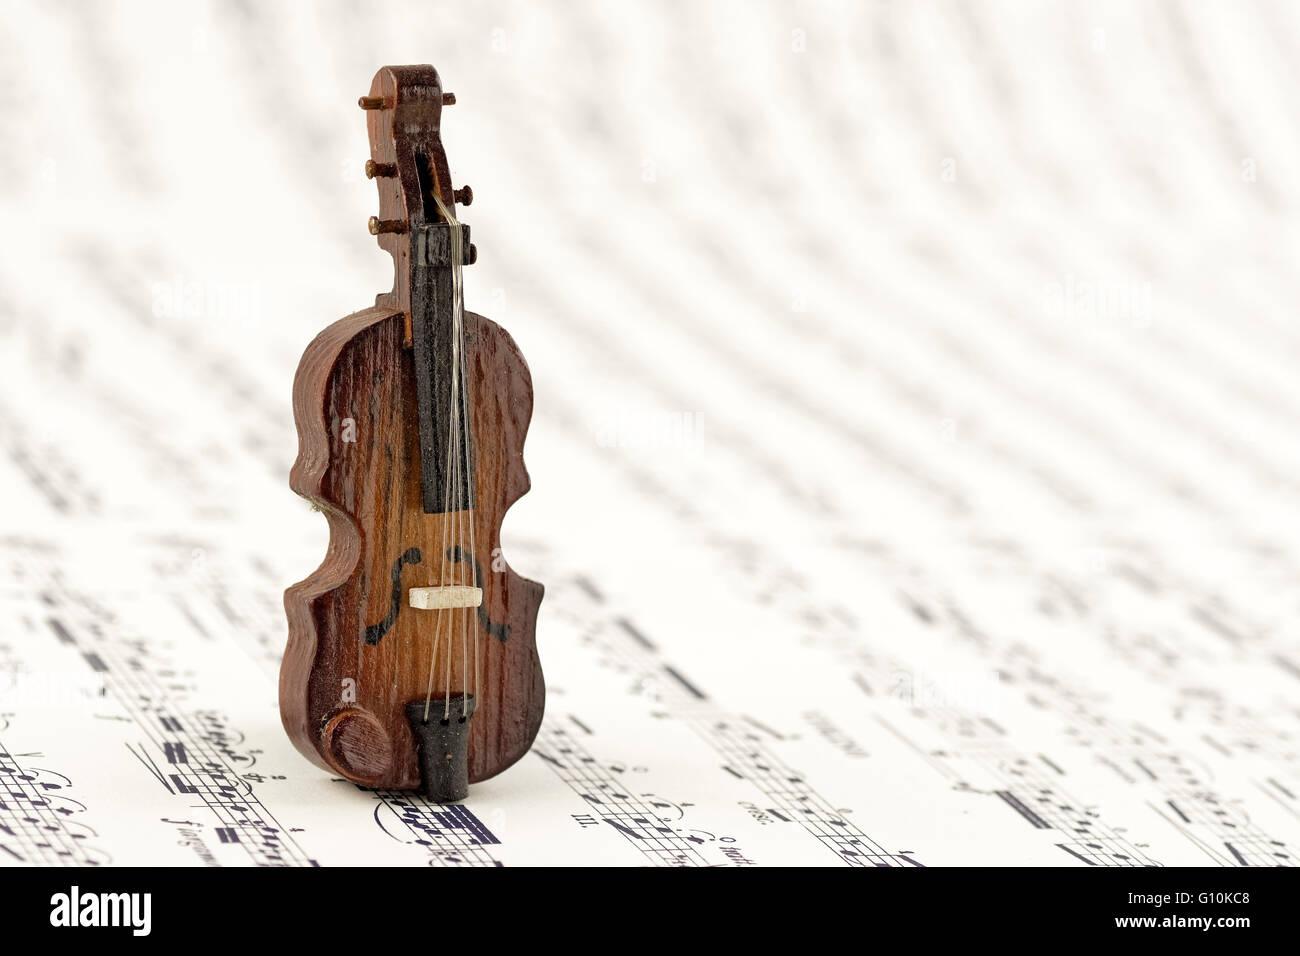 Miniature of a viola. - Stock Image